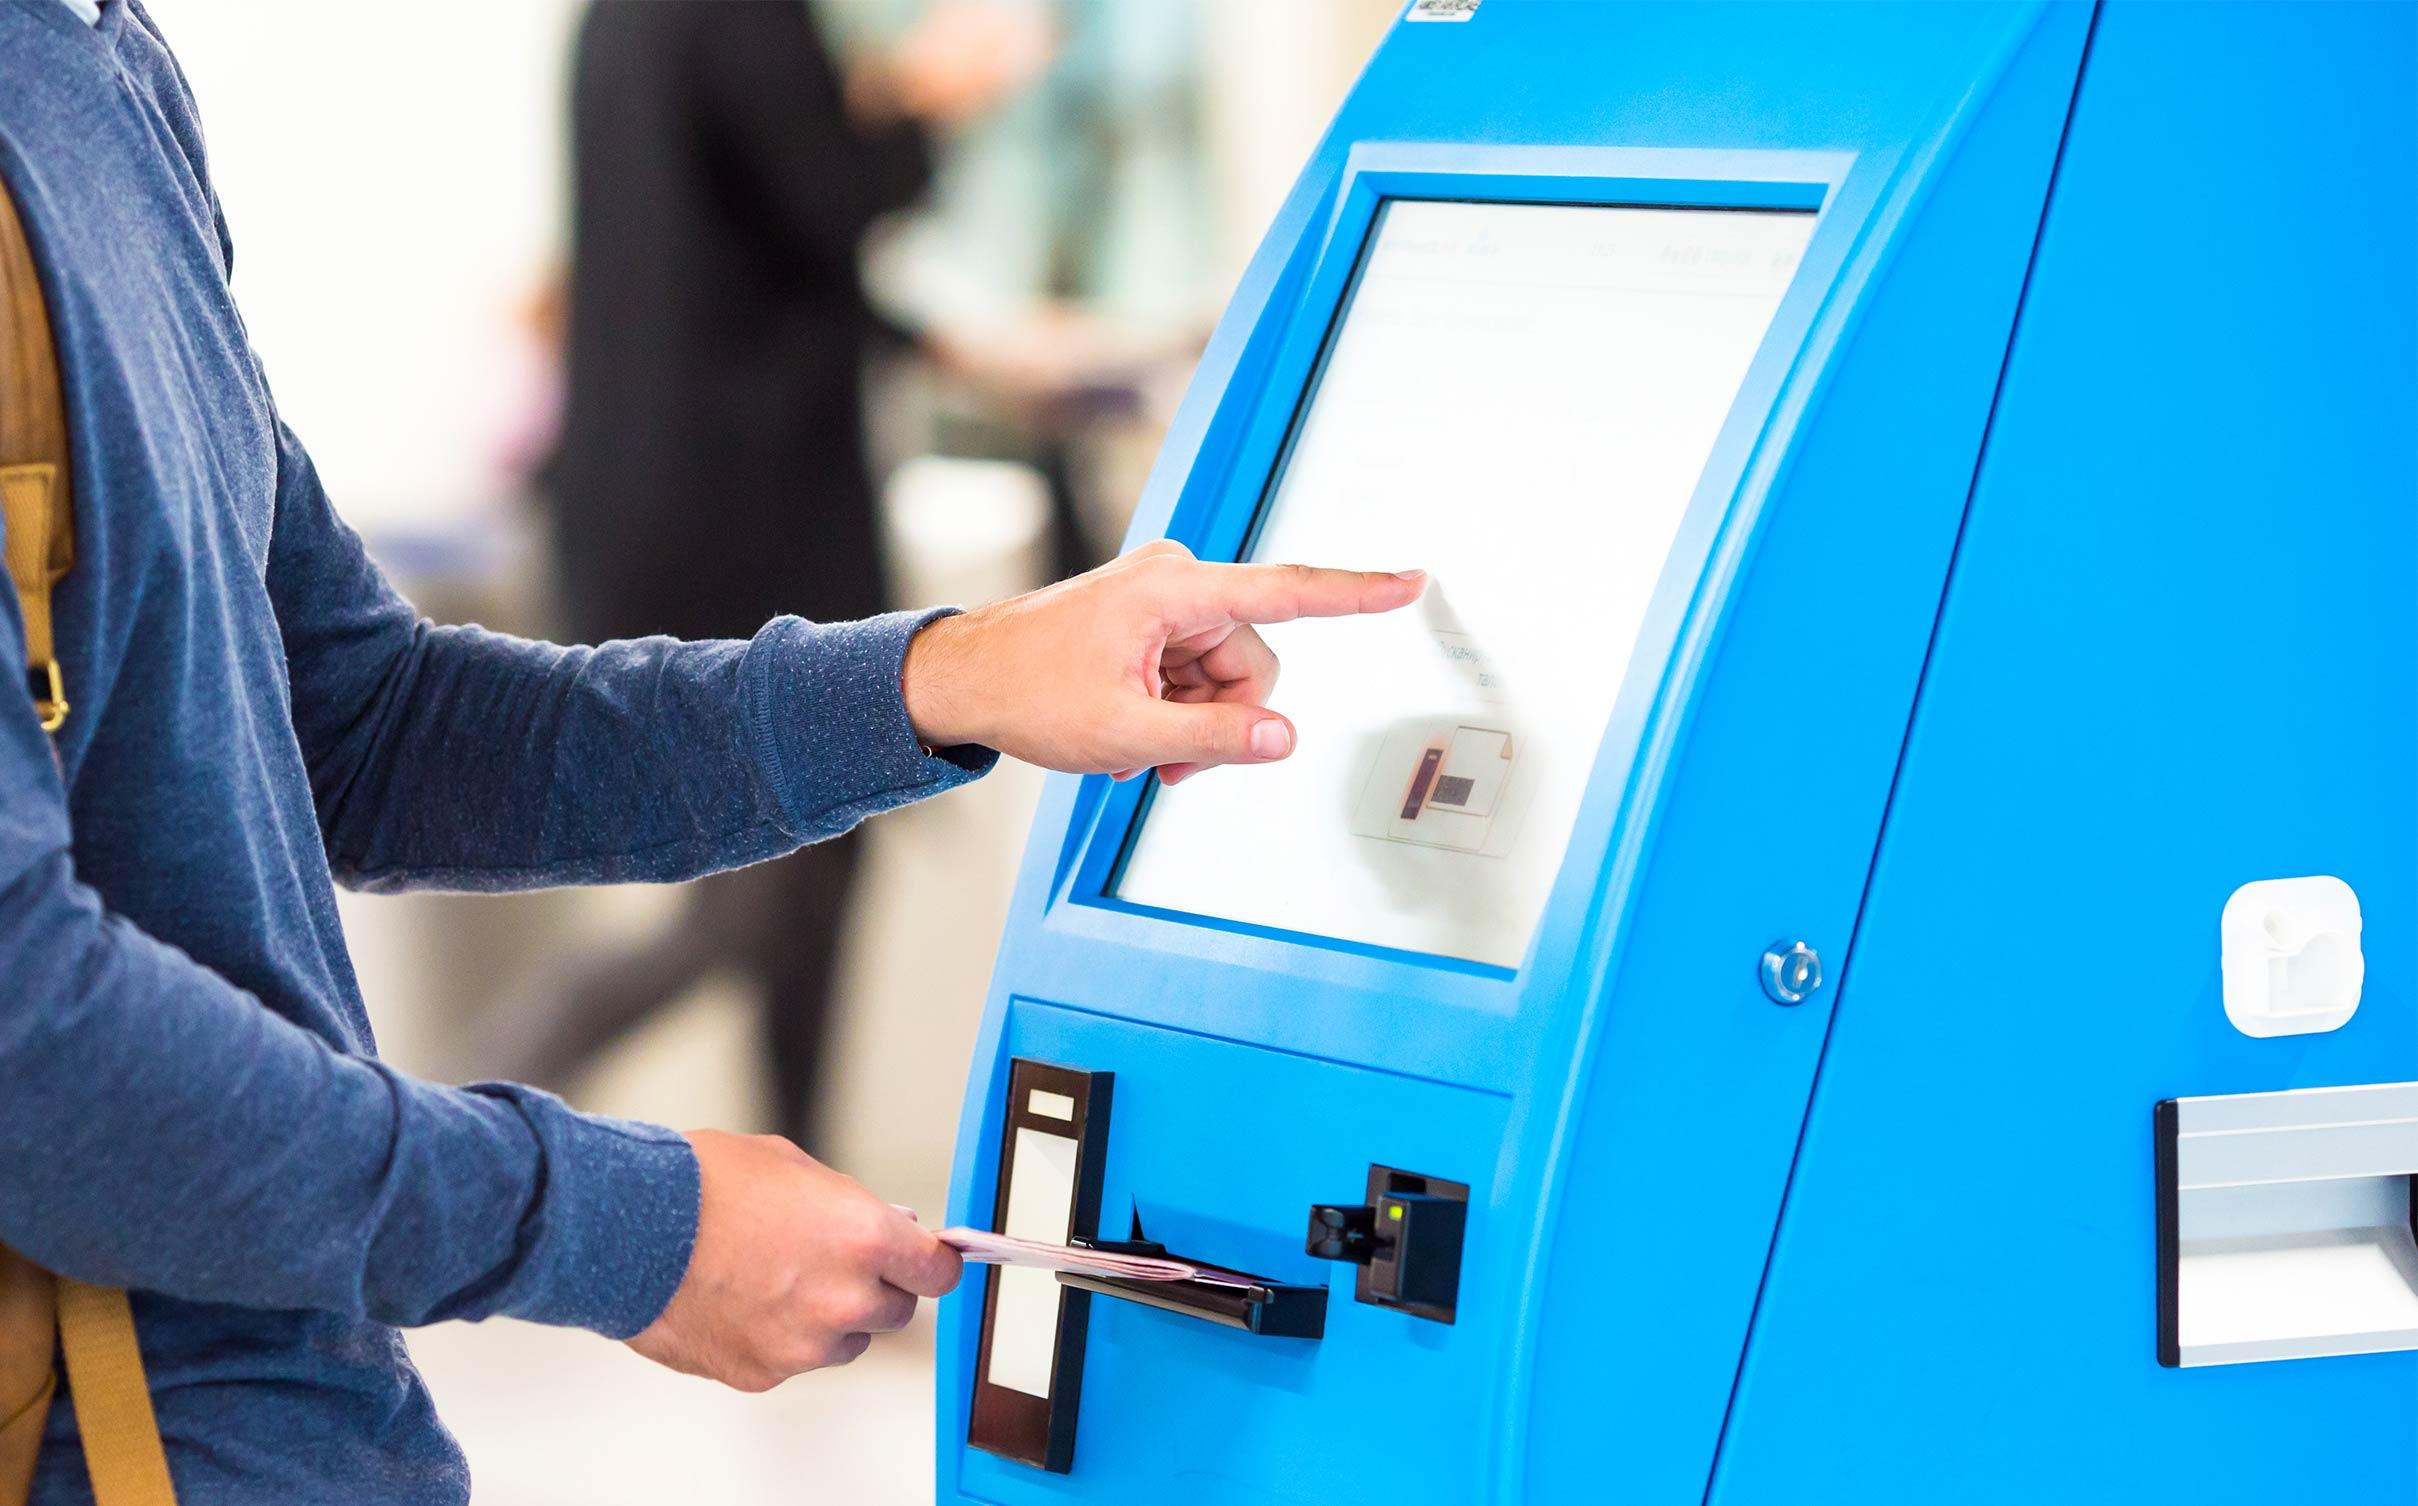 Ticketing kiosks at movie theatres